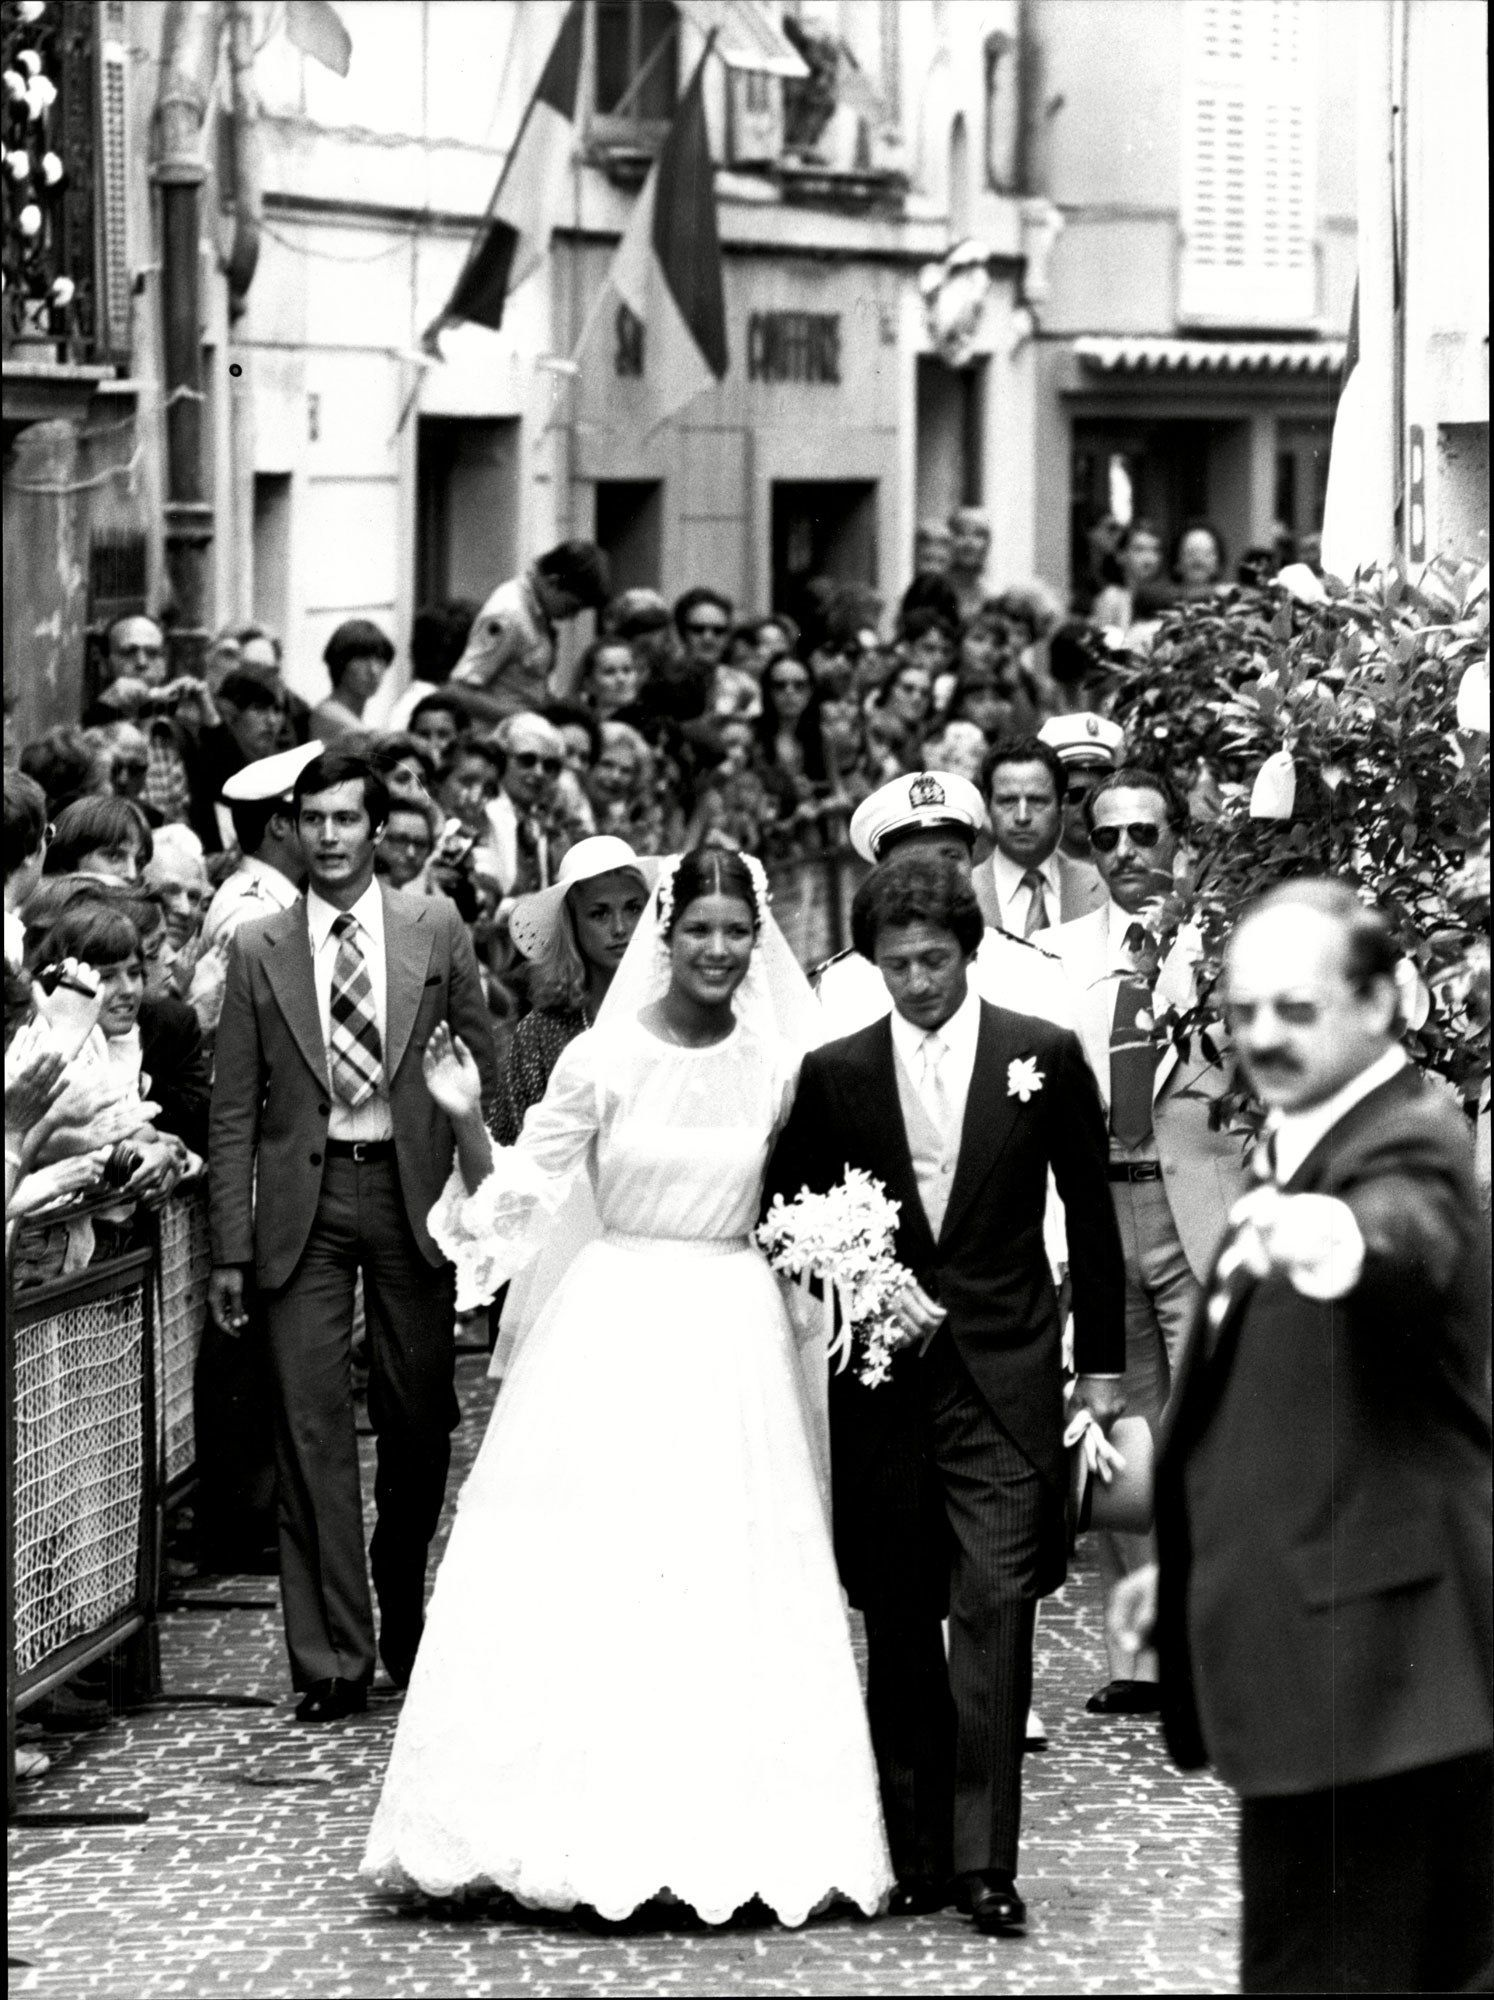 18 Memorable Royal Weddings: Prince William, Kate Middleton and More